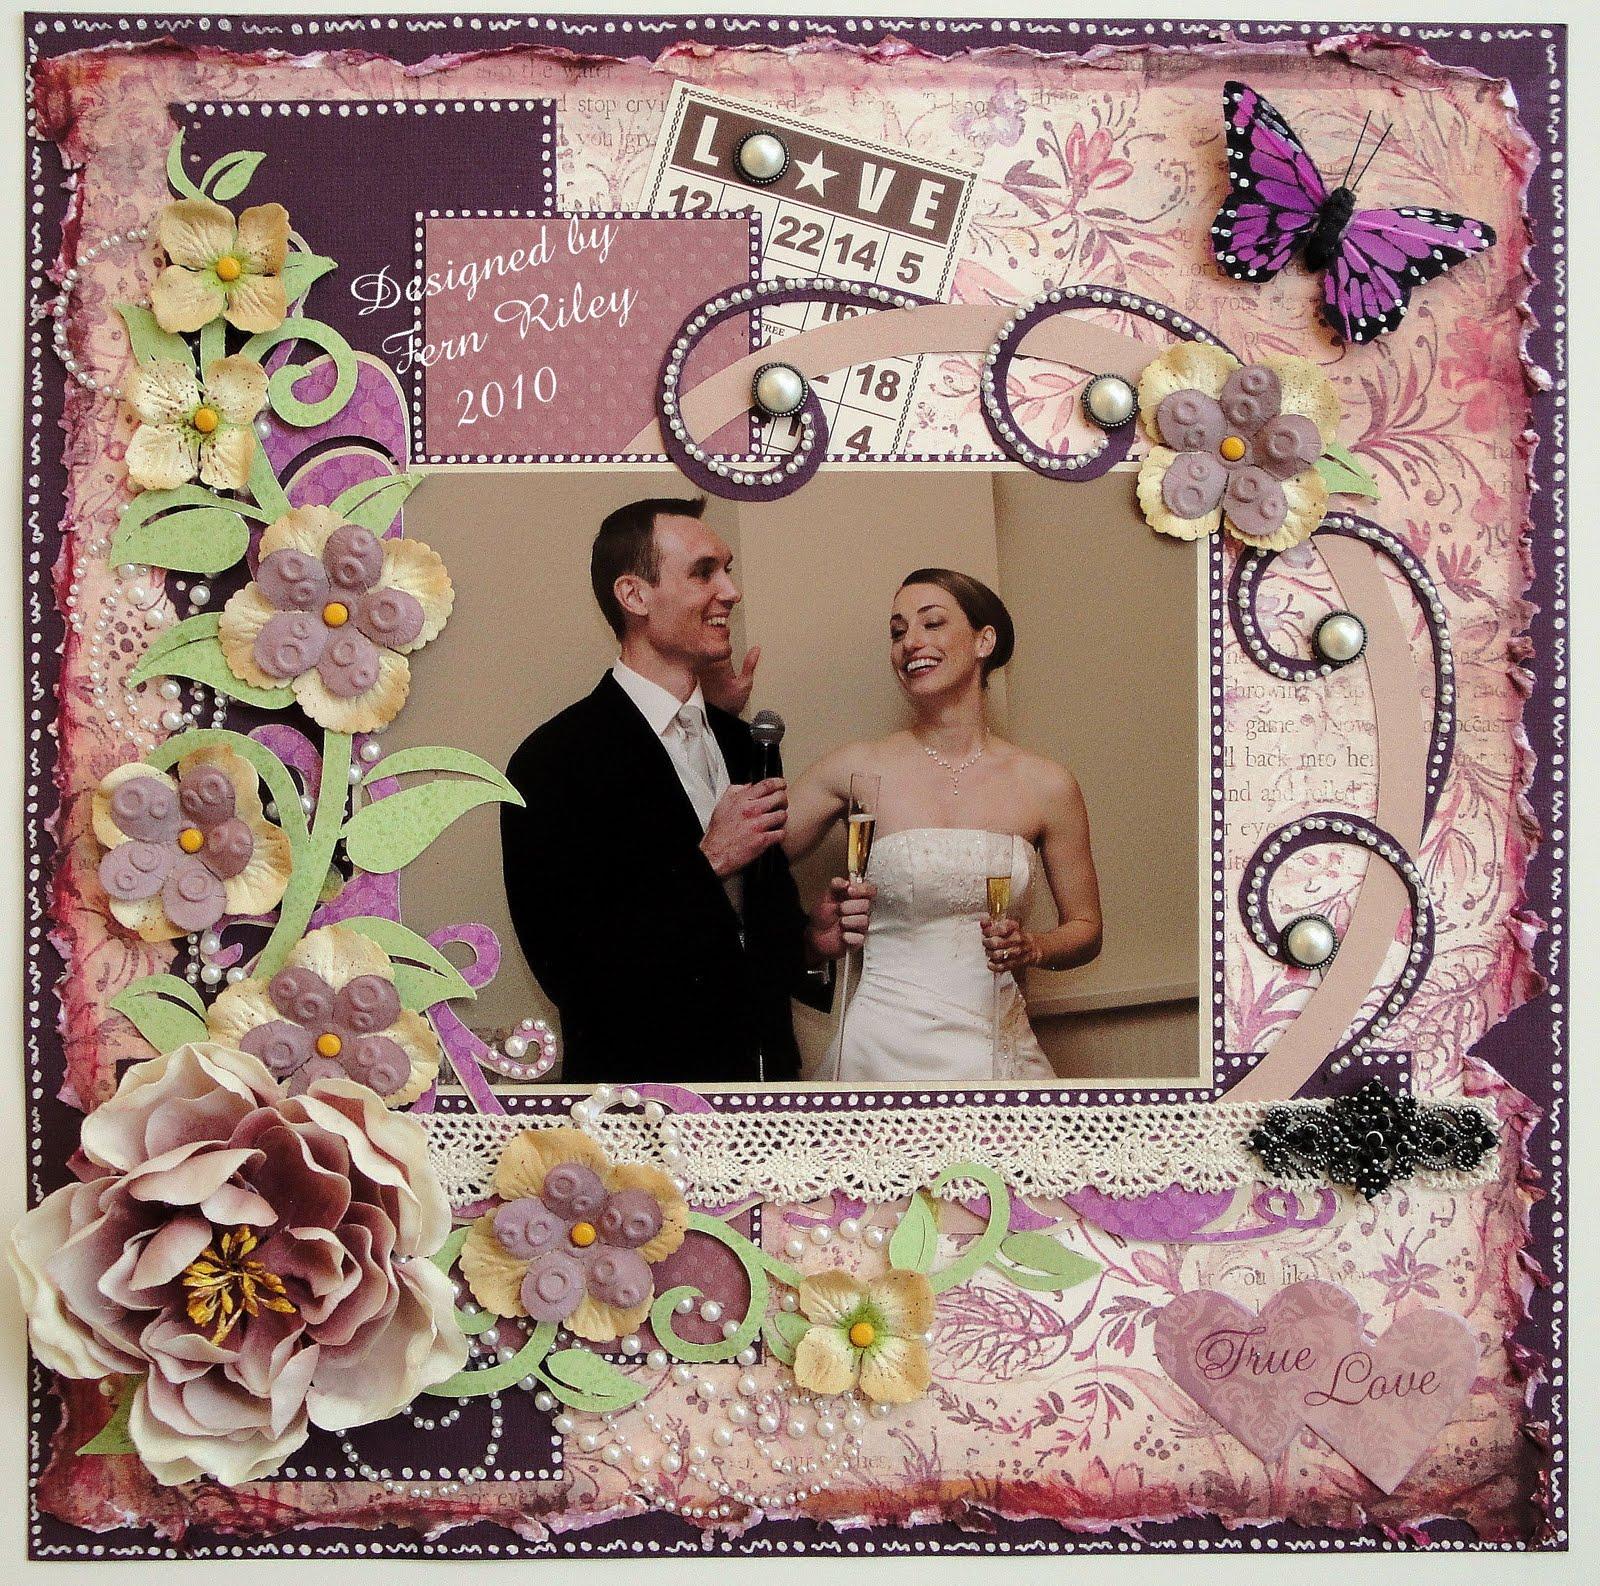 Wedding Album Photo Albums Scrapbook Wedding Scrapbooking Supplies